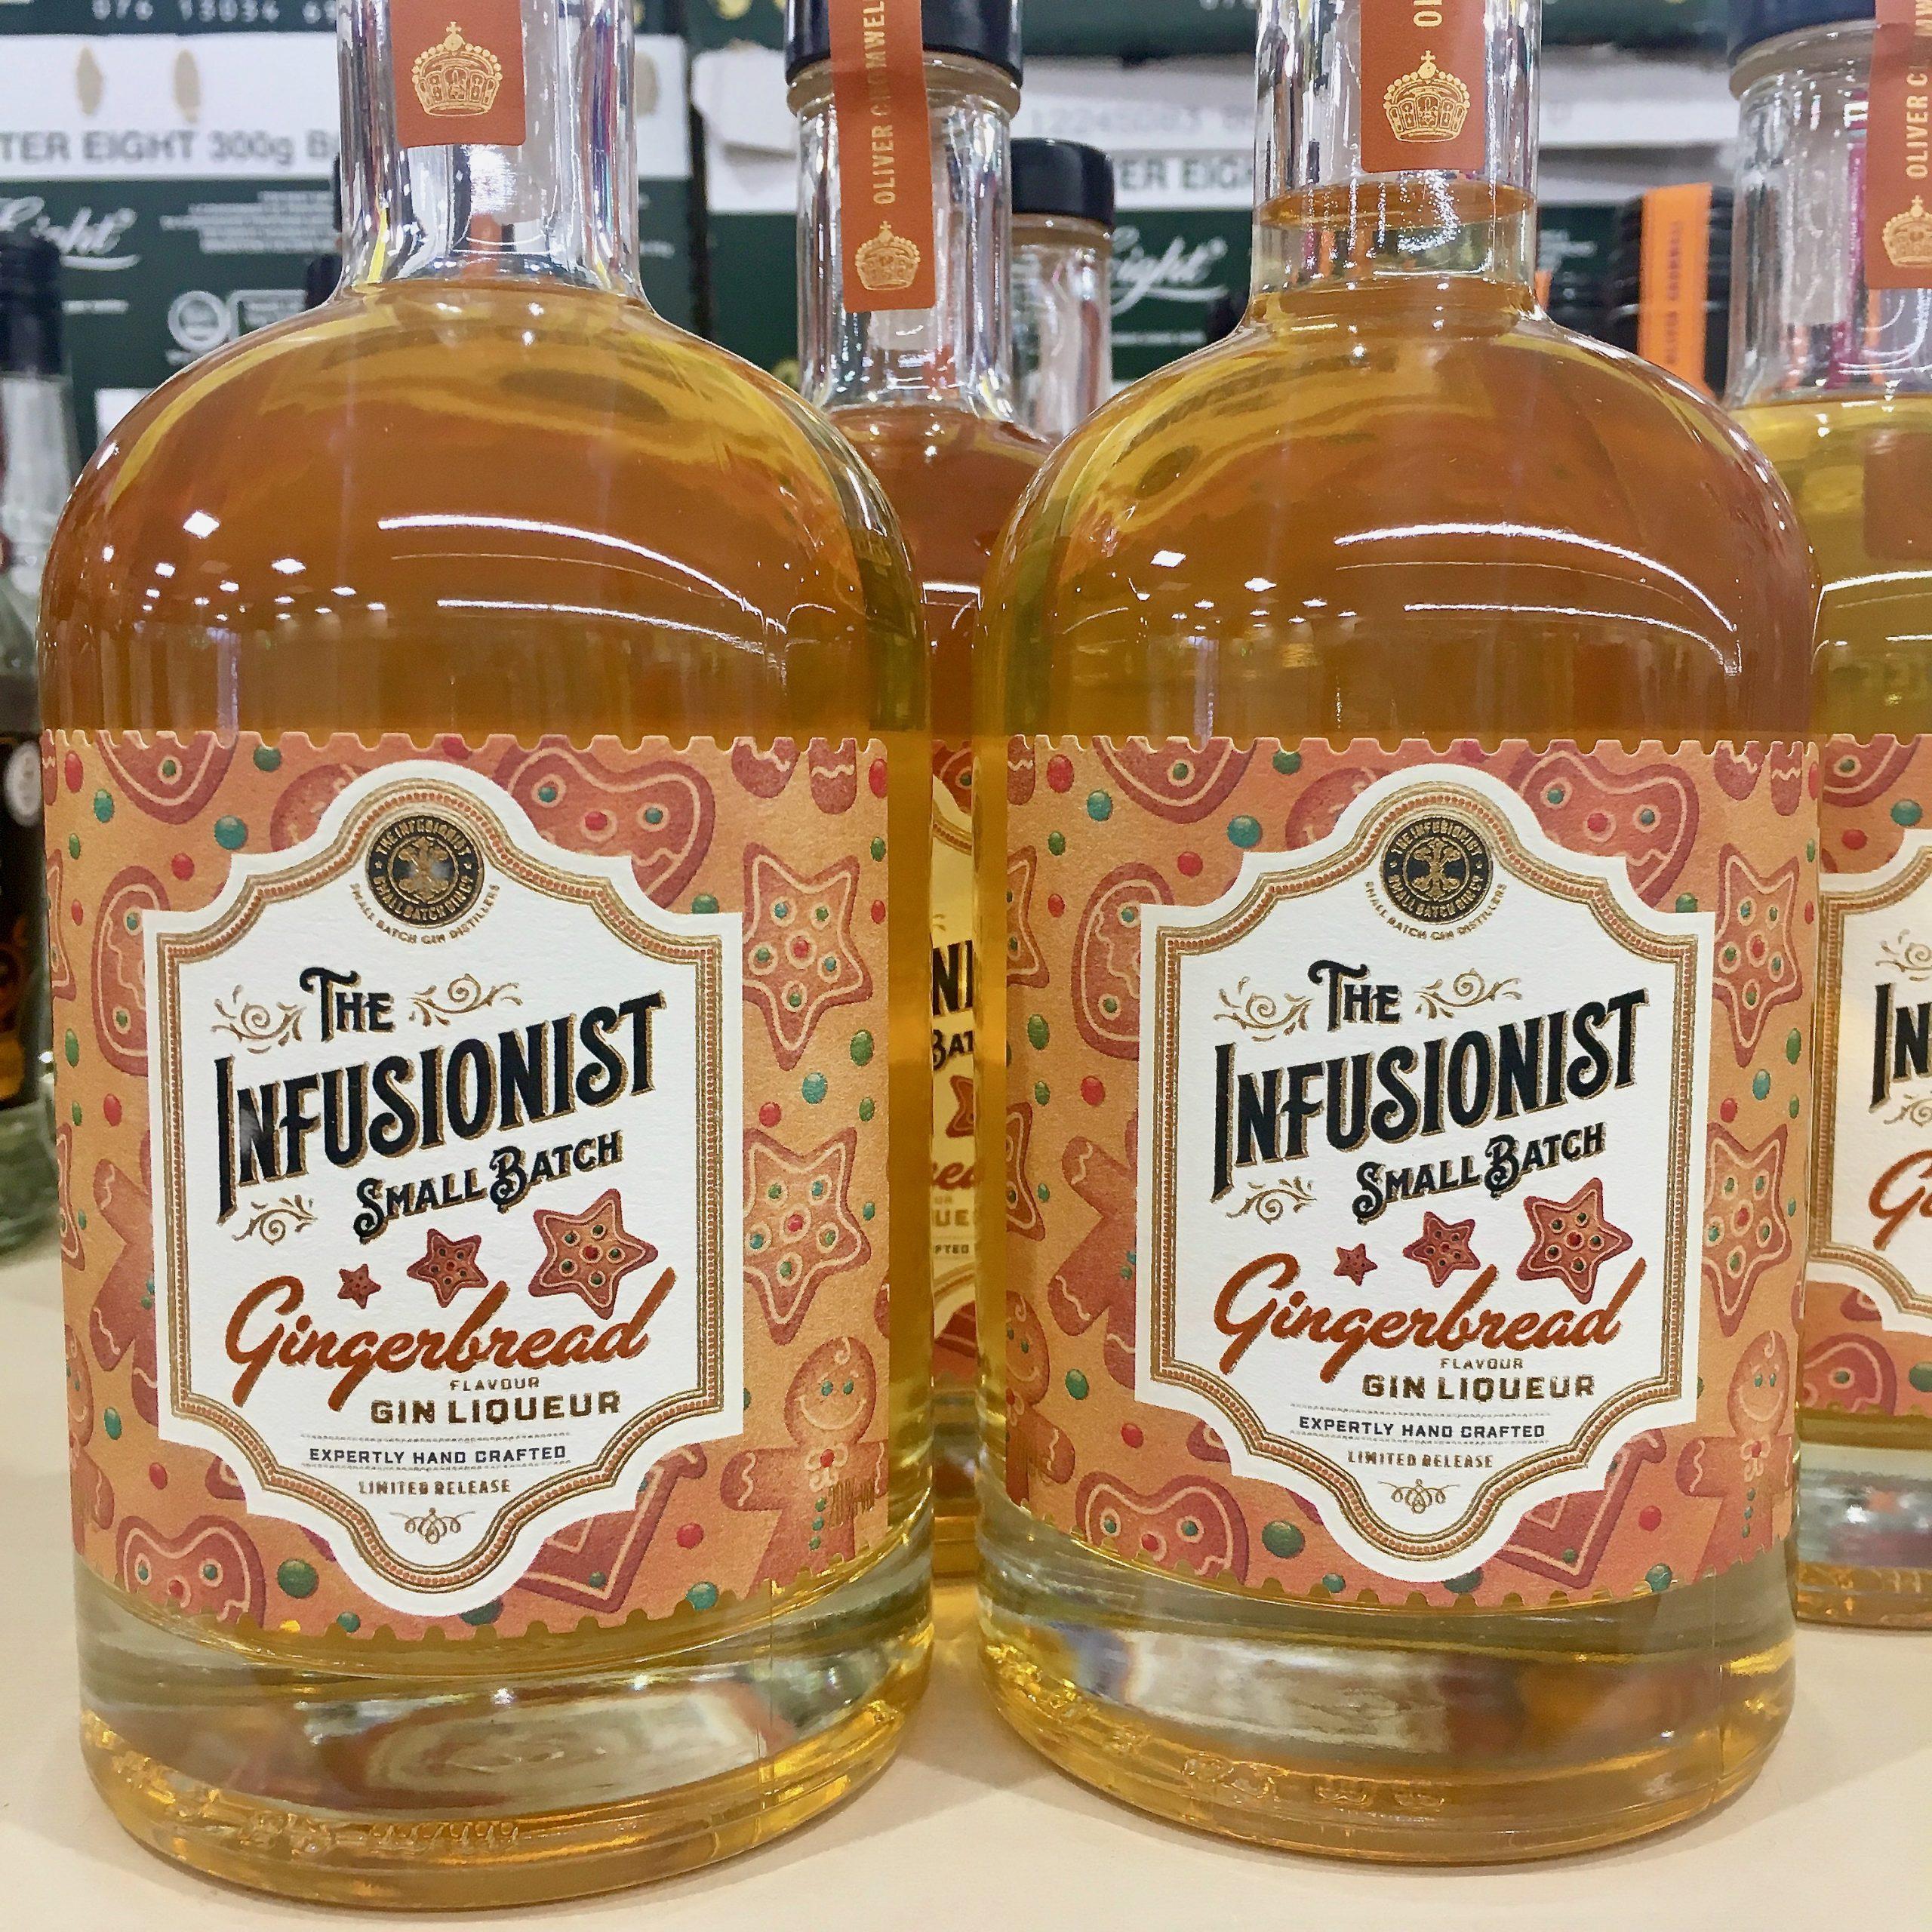 Aldi The Infusionist Gingerbread Gin Liqueur